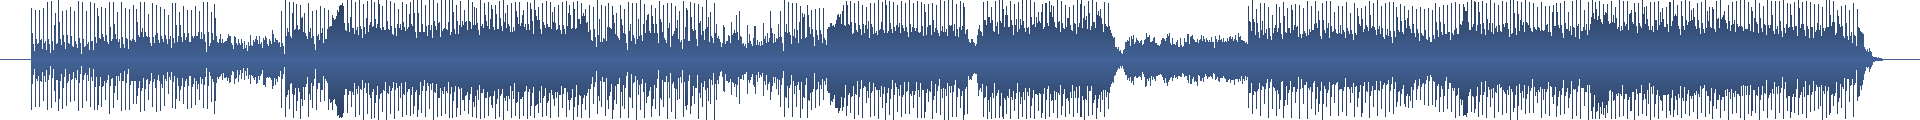 My voice 7.7 remix 050514tr m c 320kbps